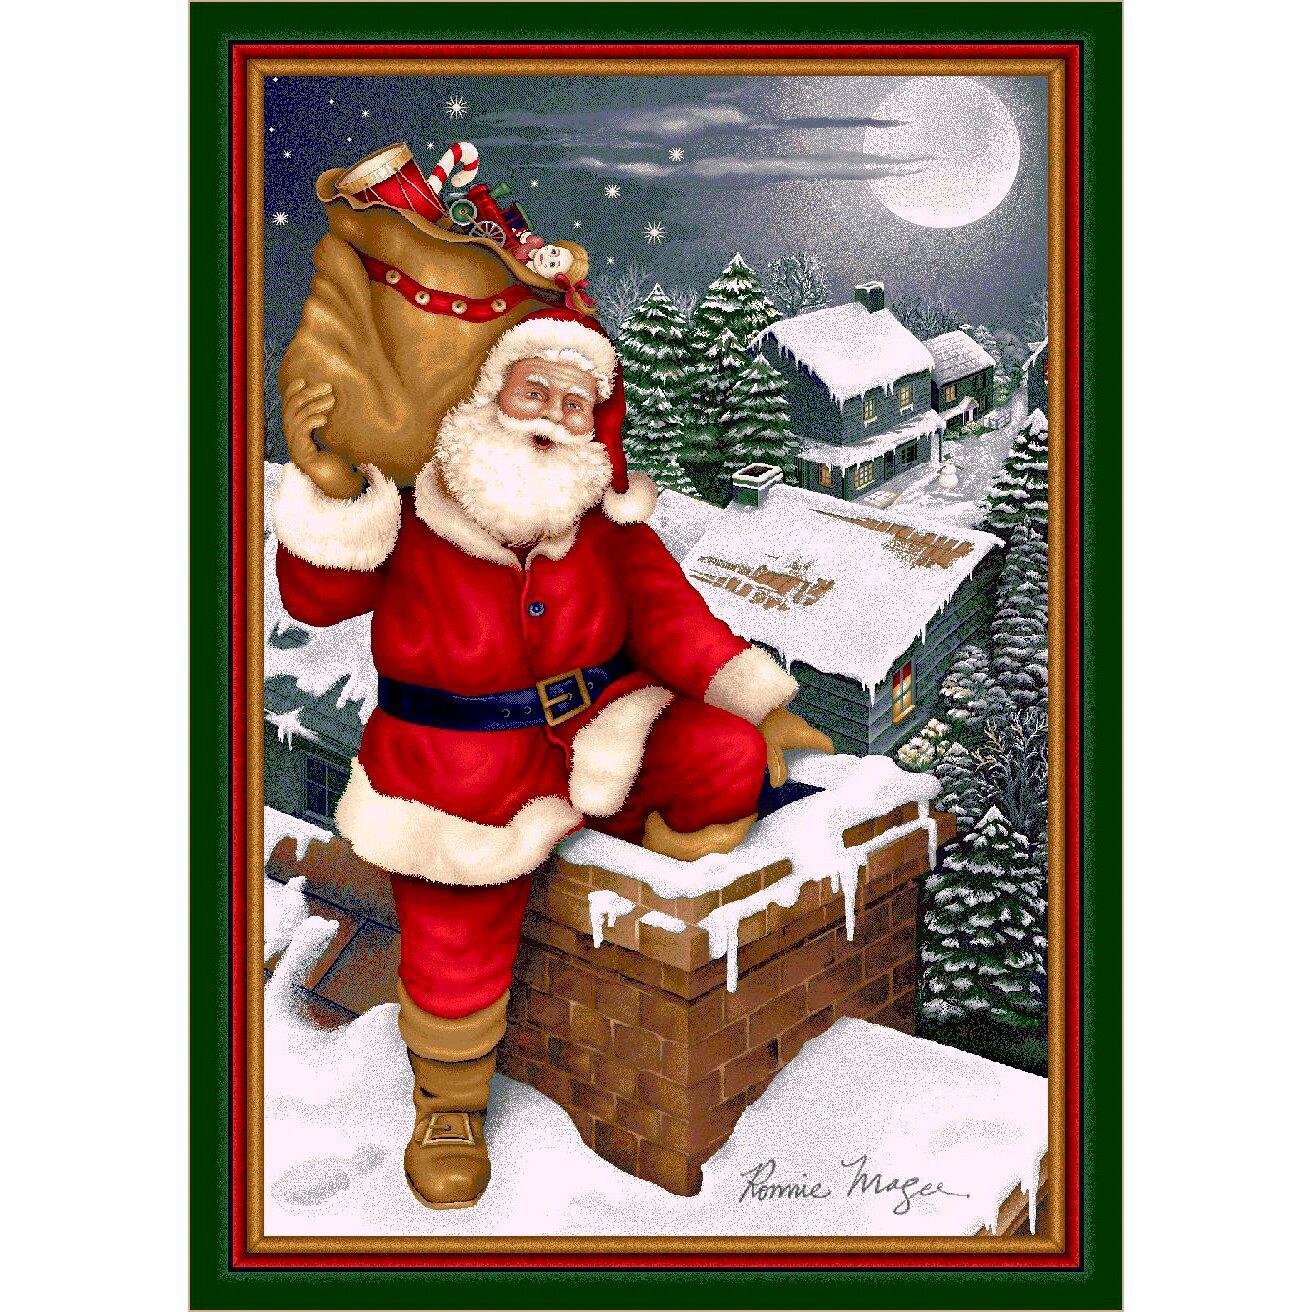 Foyer Rugs For Christmas: Milliken Winter Seasonal Up On The Housetop Christmas Area